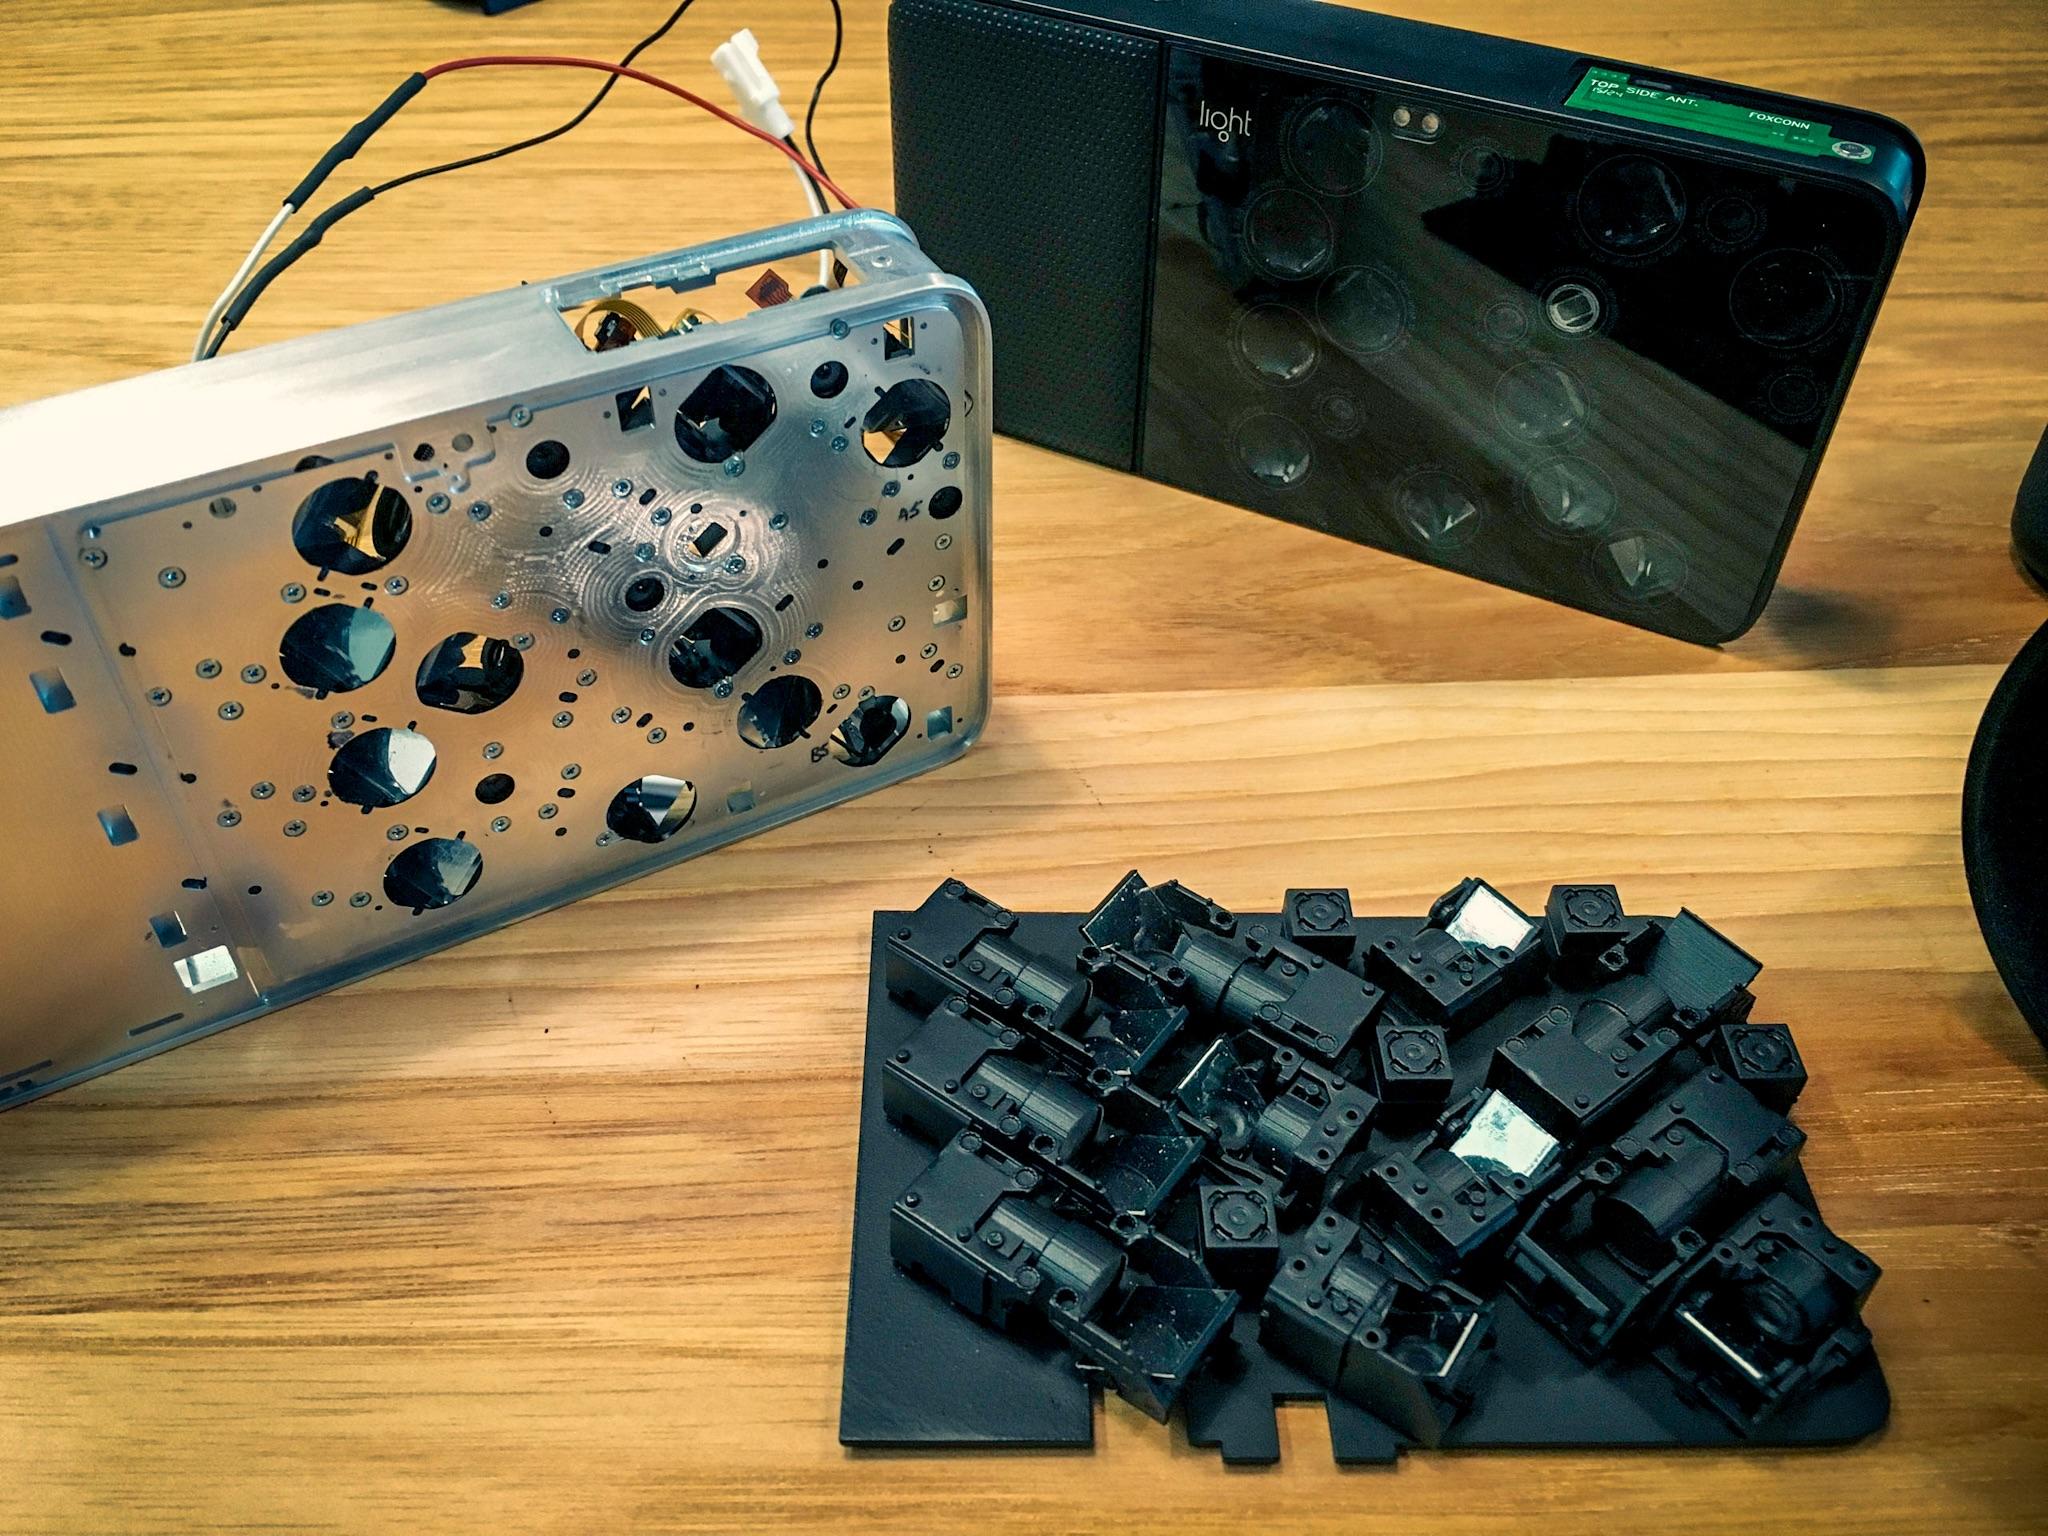 The Light L16 prototype spills its guts.